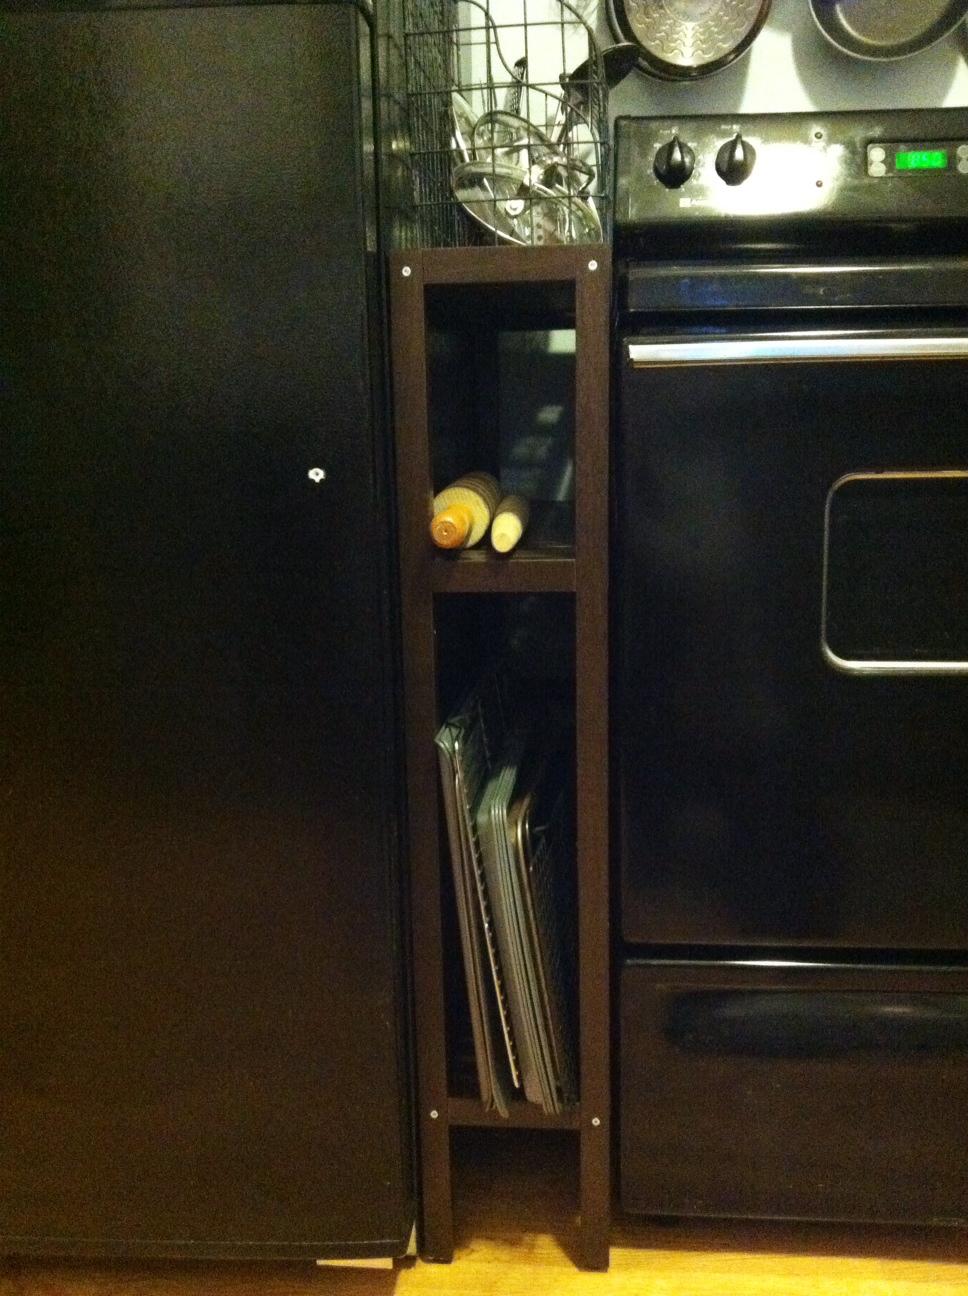 Can you imagine a skinnier shelf?